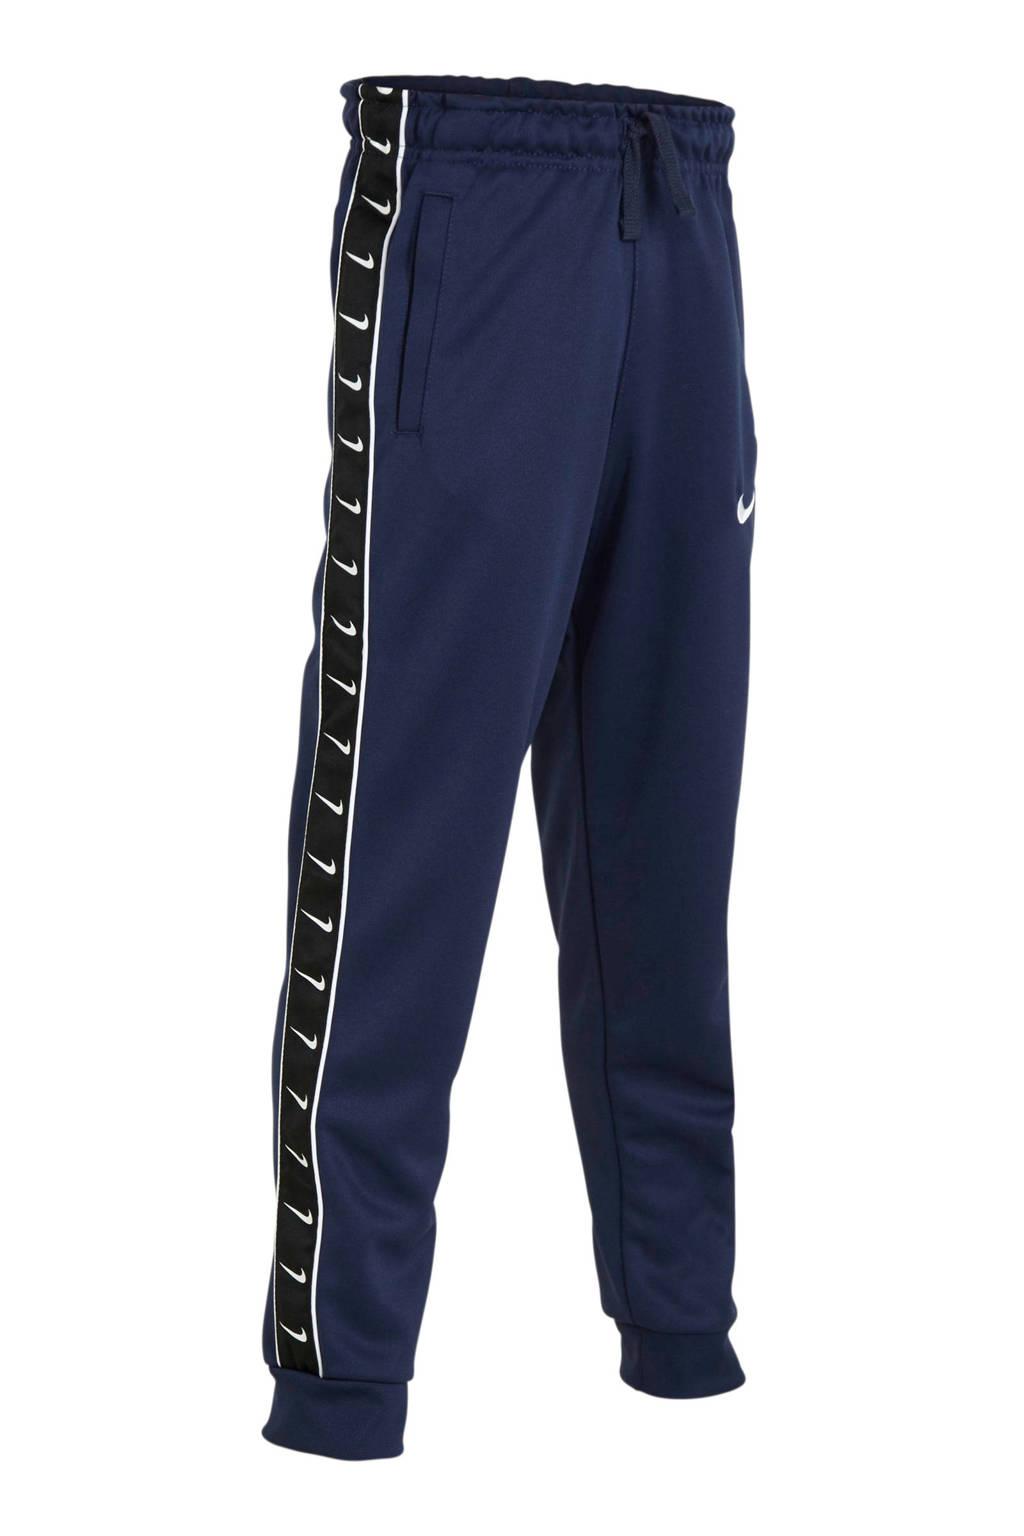 Nike   trainingsbroek donkerblauw/zwart, Donkerblauw/zwart